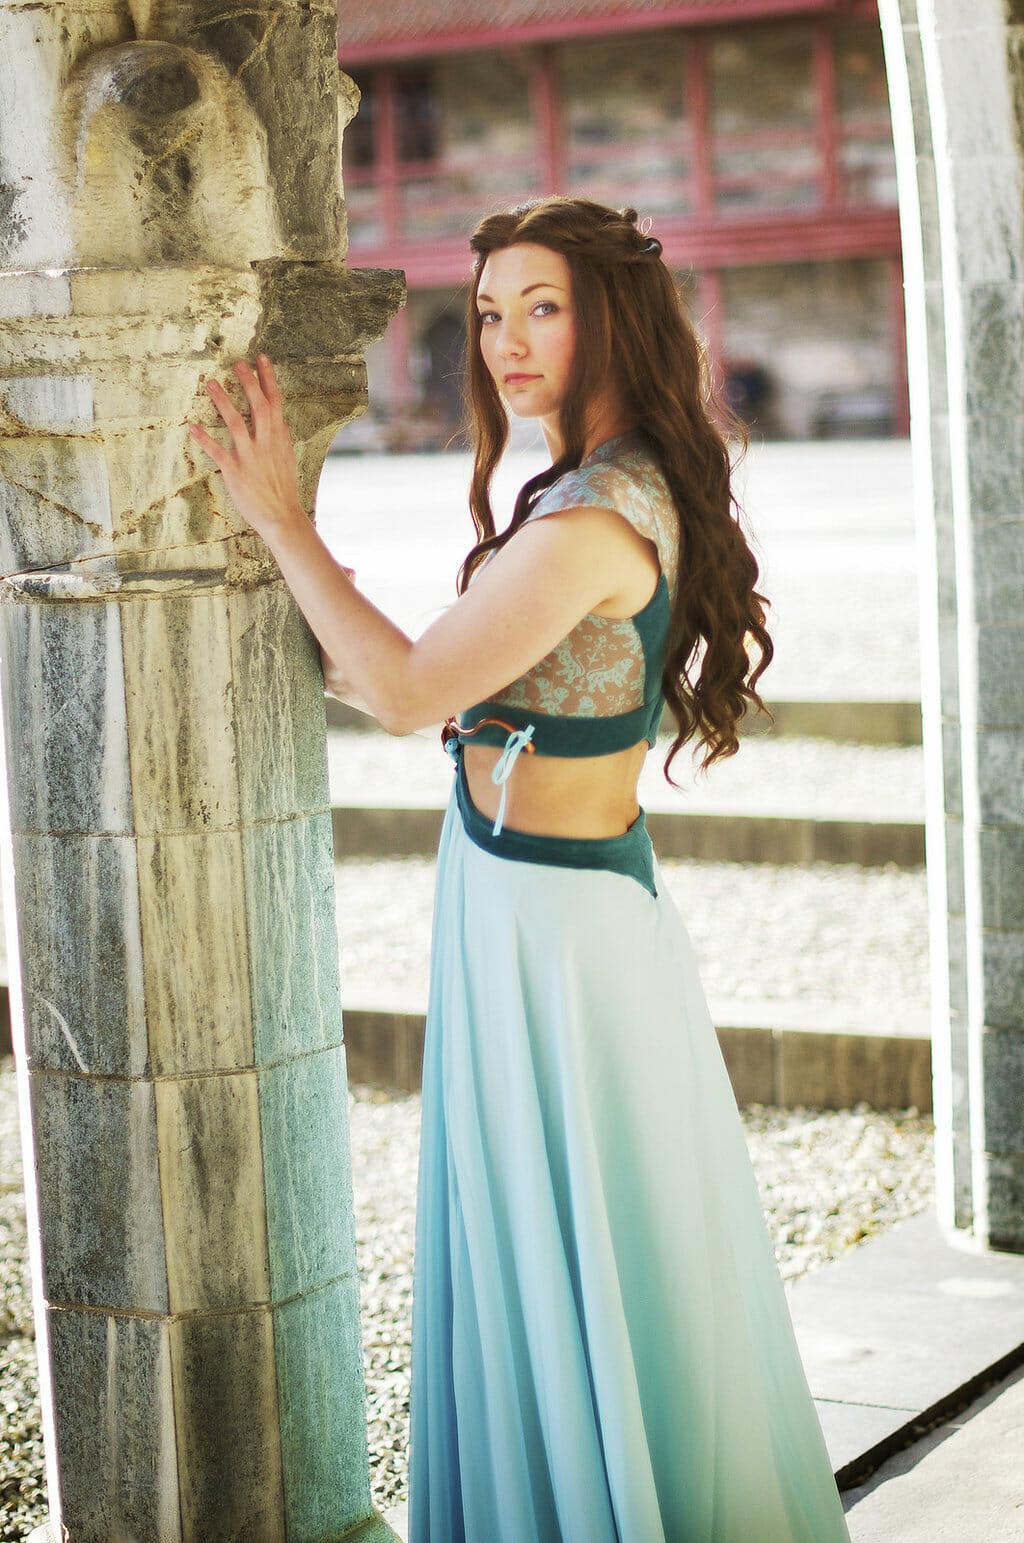 margaery_tyrell__green_lions_dress__7_by_santatory-d760xxz